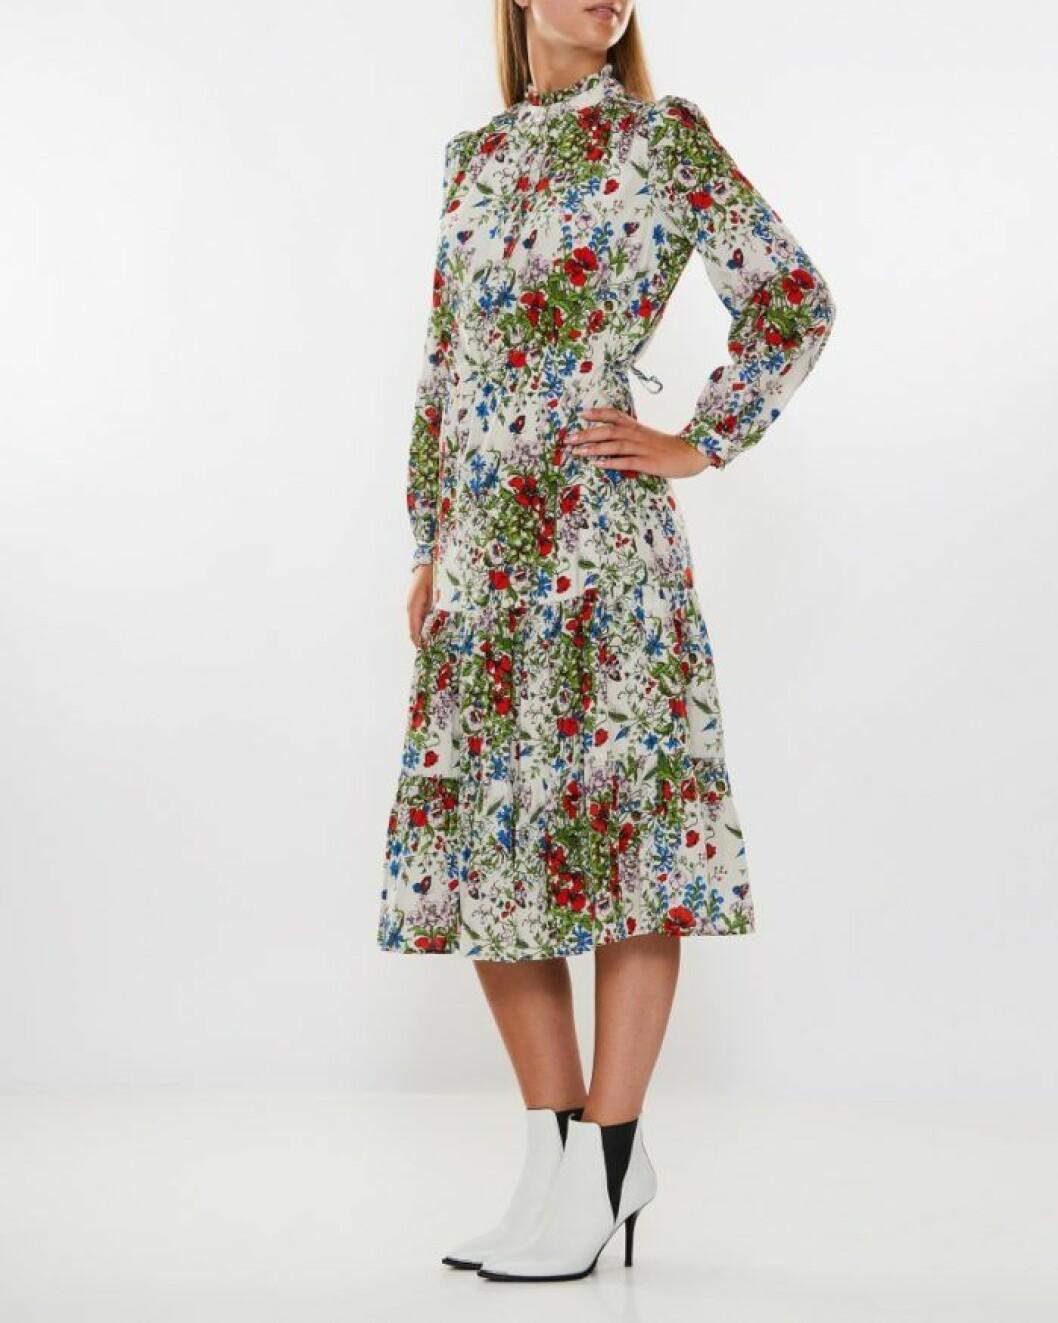 Blommig klänning från Heartmade by Julie Fagerholt